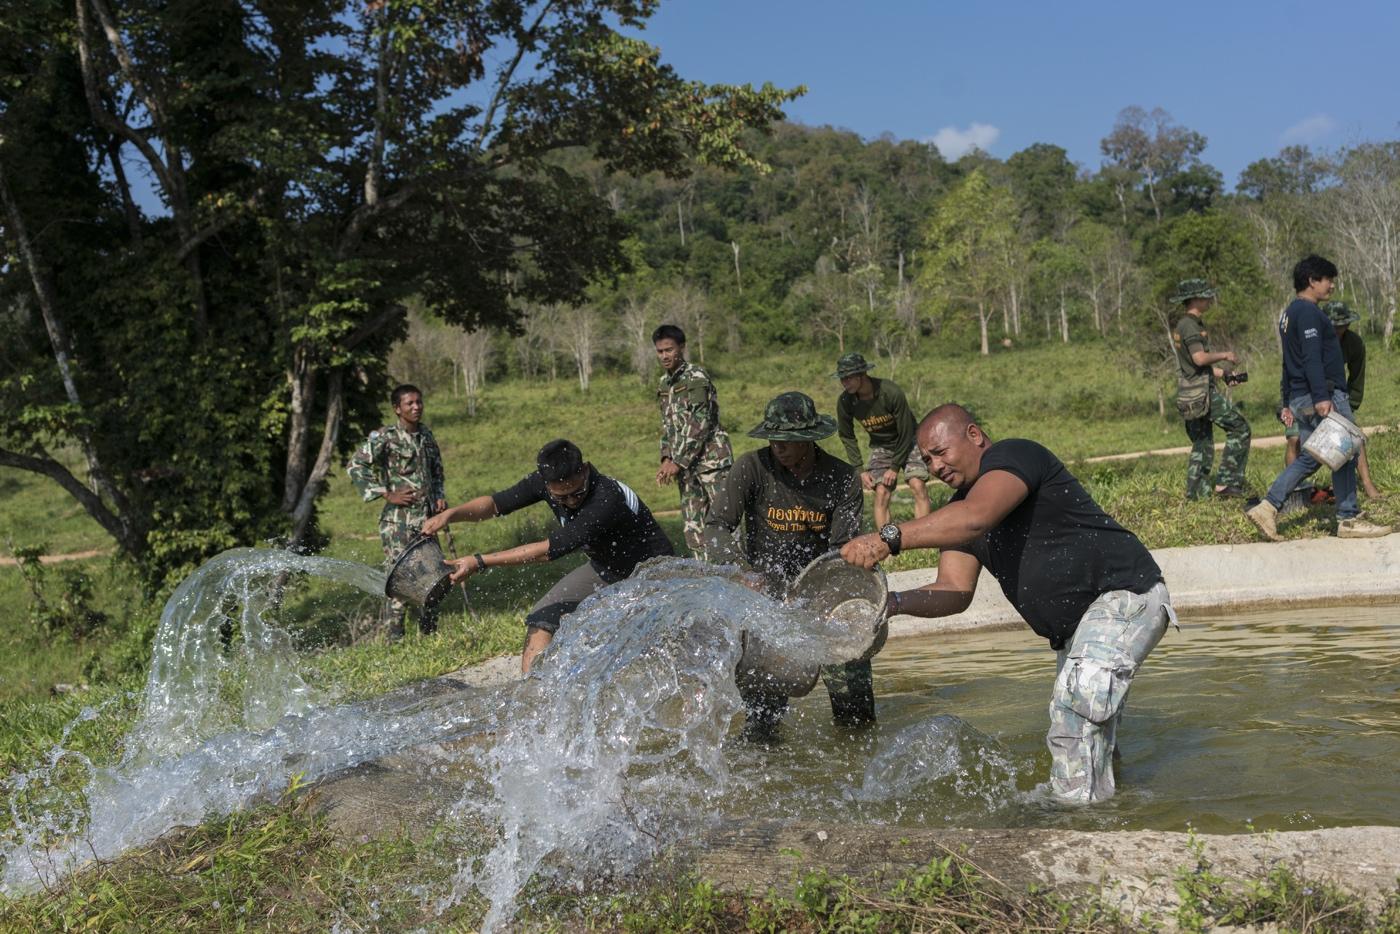 WWF Thailand, Kui Buri - Inside the park